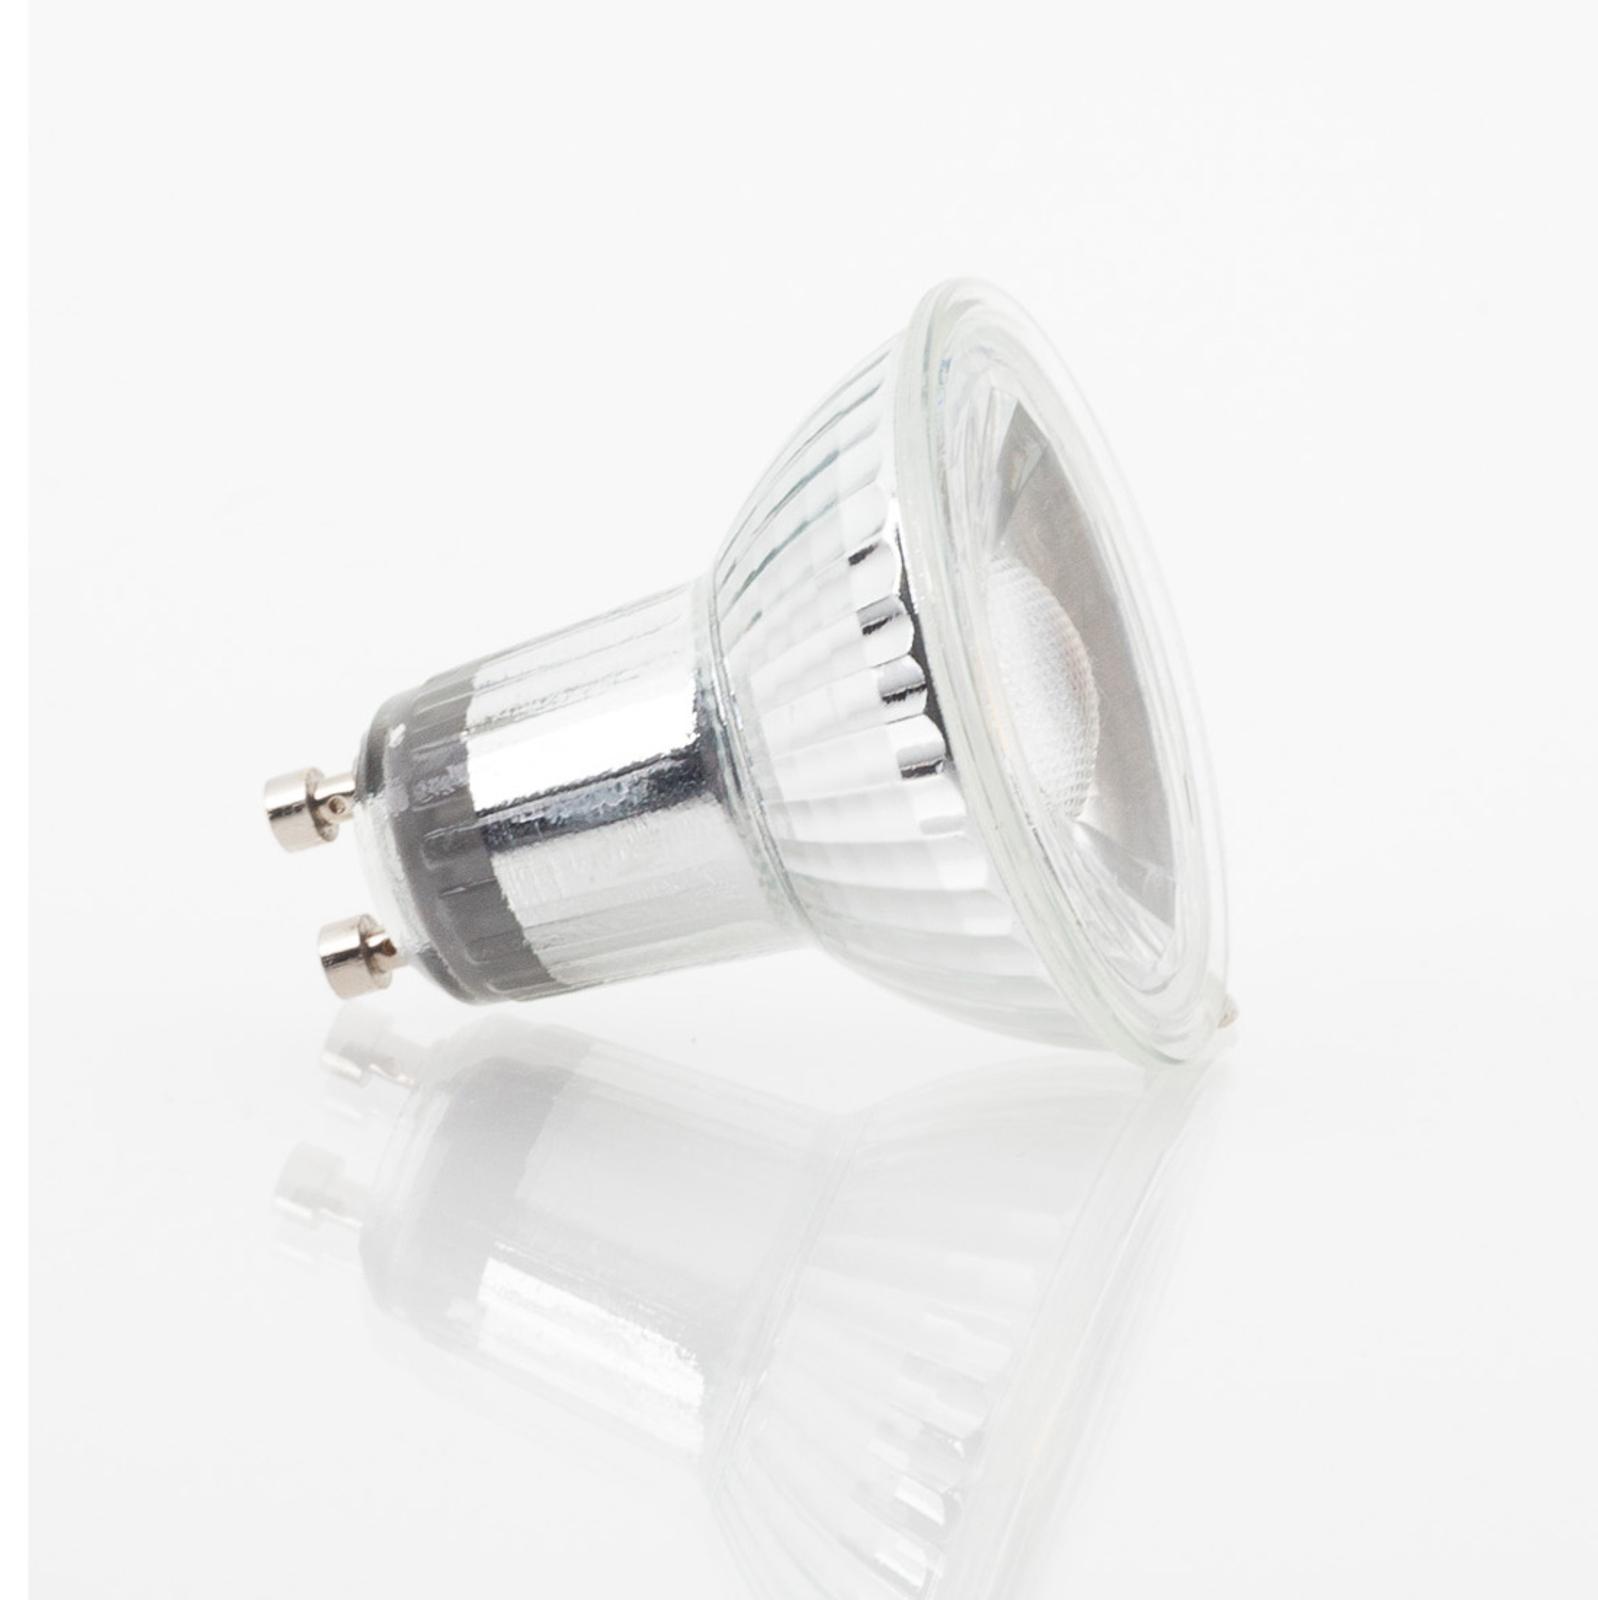 GU10 5W 830 LED bulb reflector, dimmable_9646006_1